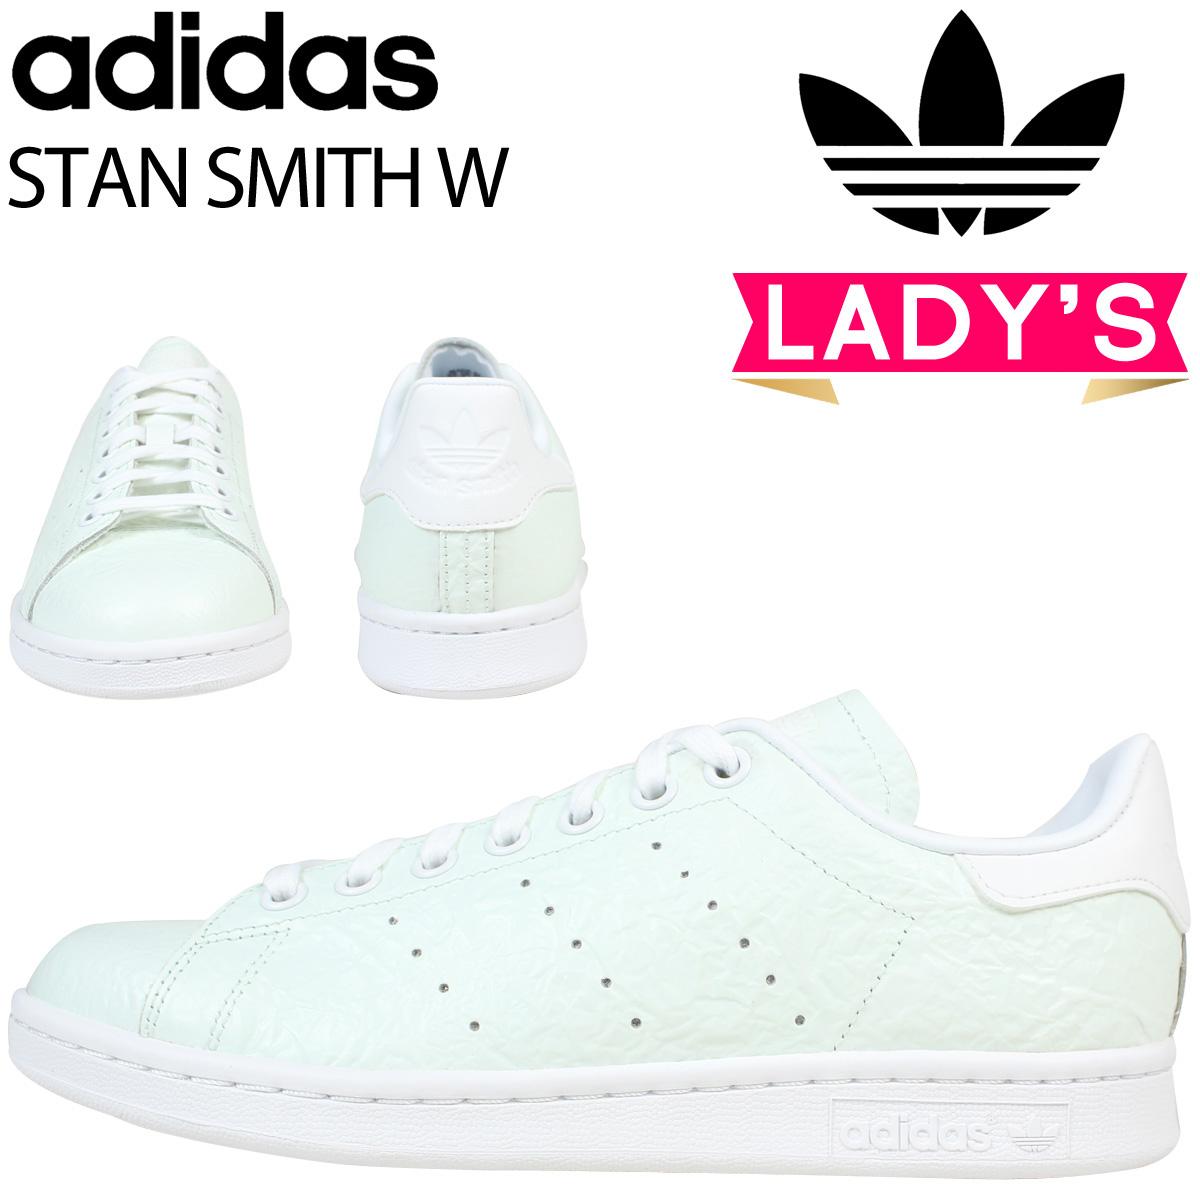 more photos 56dcf 6c13c adidas Originals Adidas originals Stan Smith sneakers Lady's STAN SMITH W  S76666 shoes white white